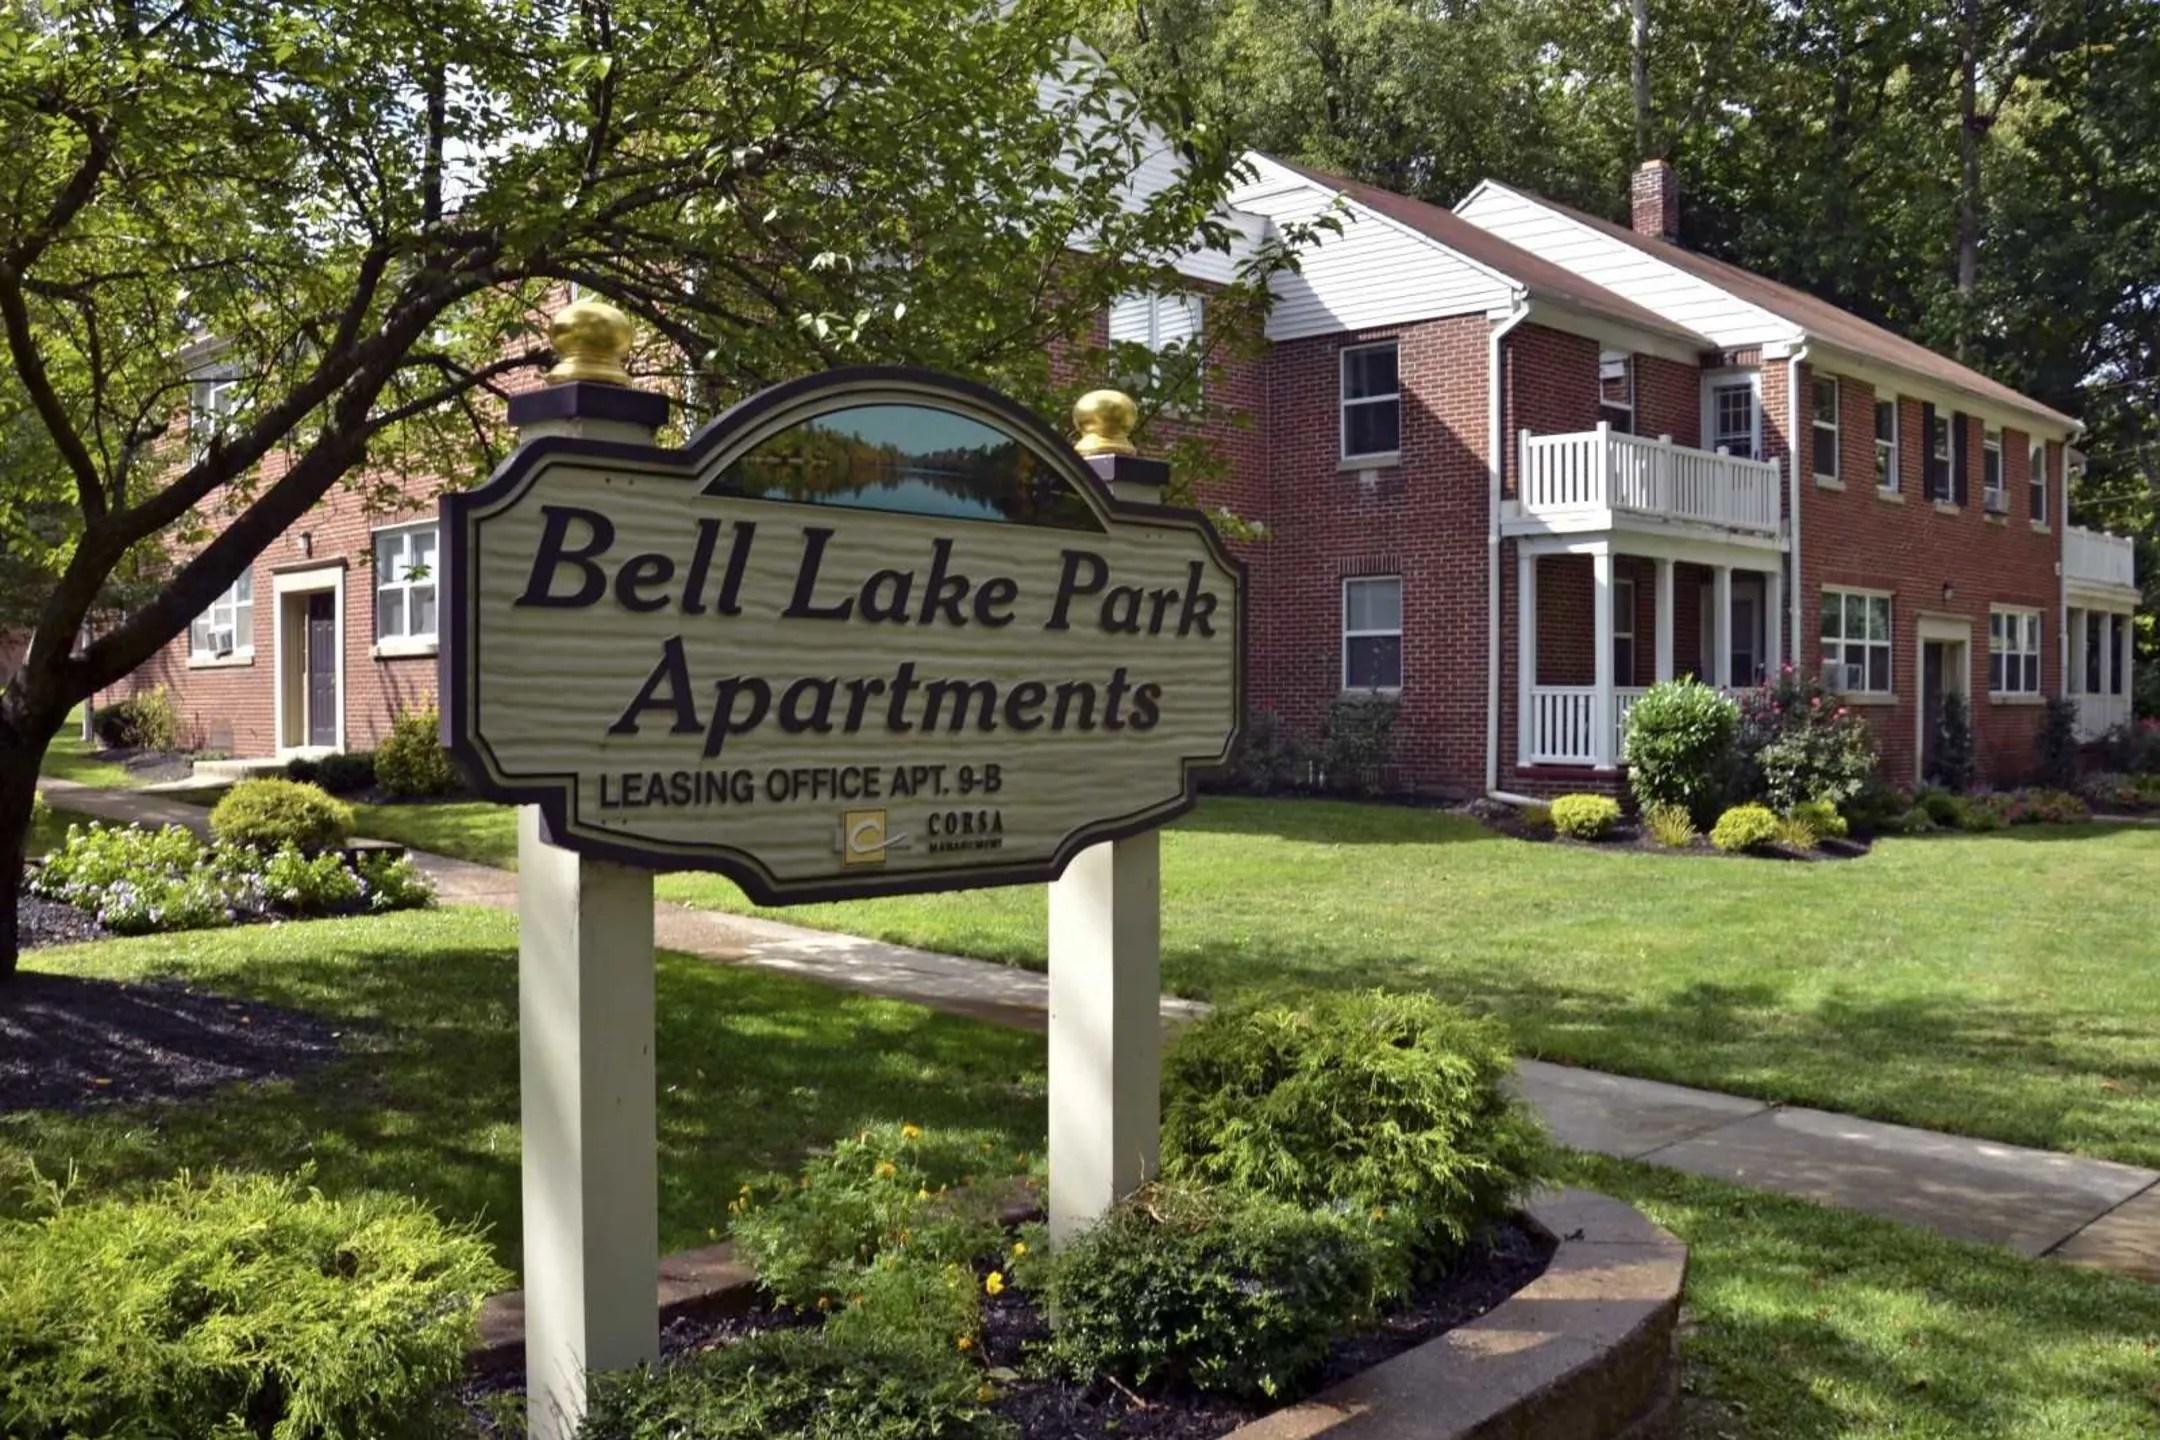 Bell Lake Park Apartments  Woodbury NJ 08096